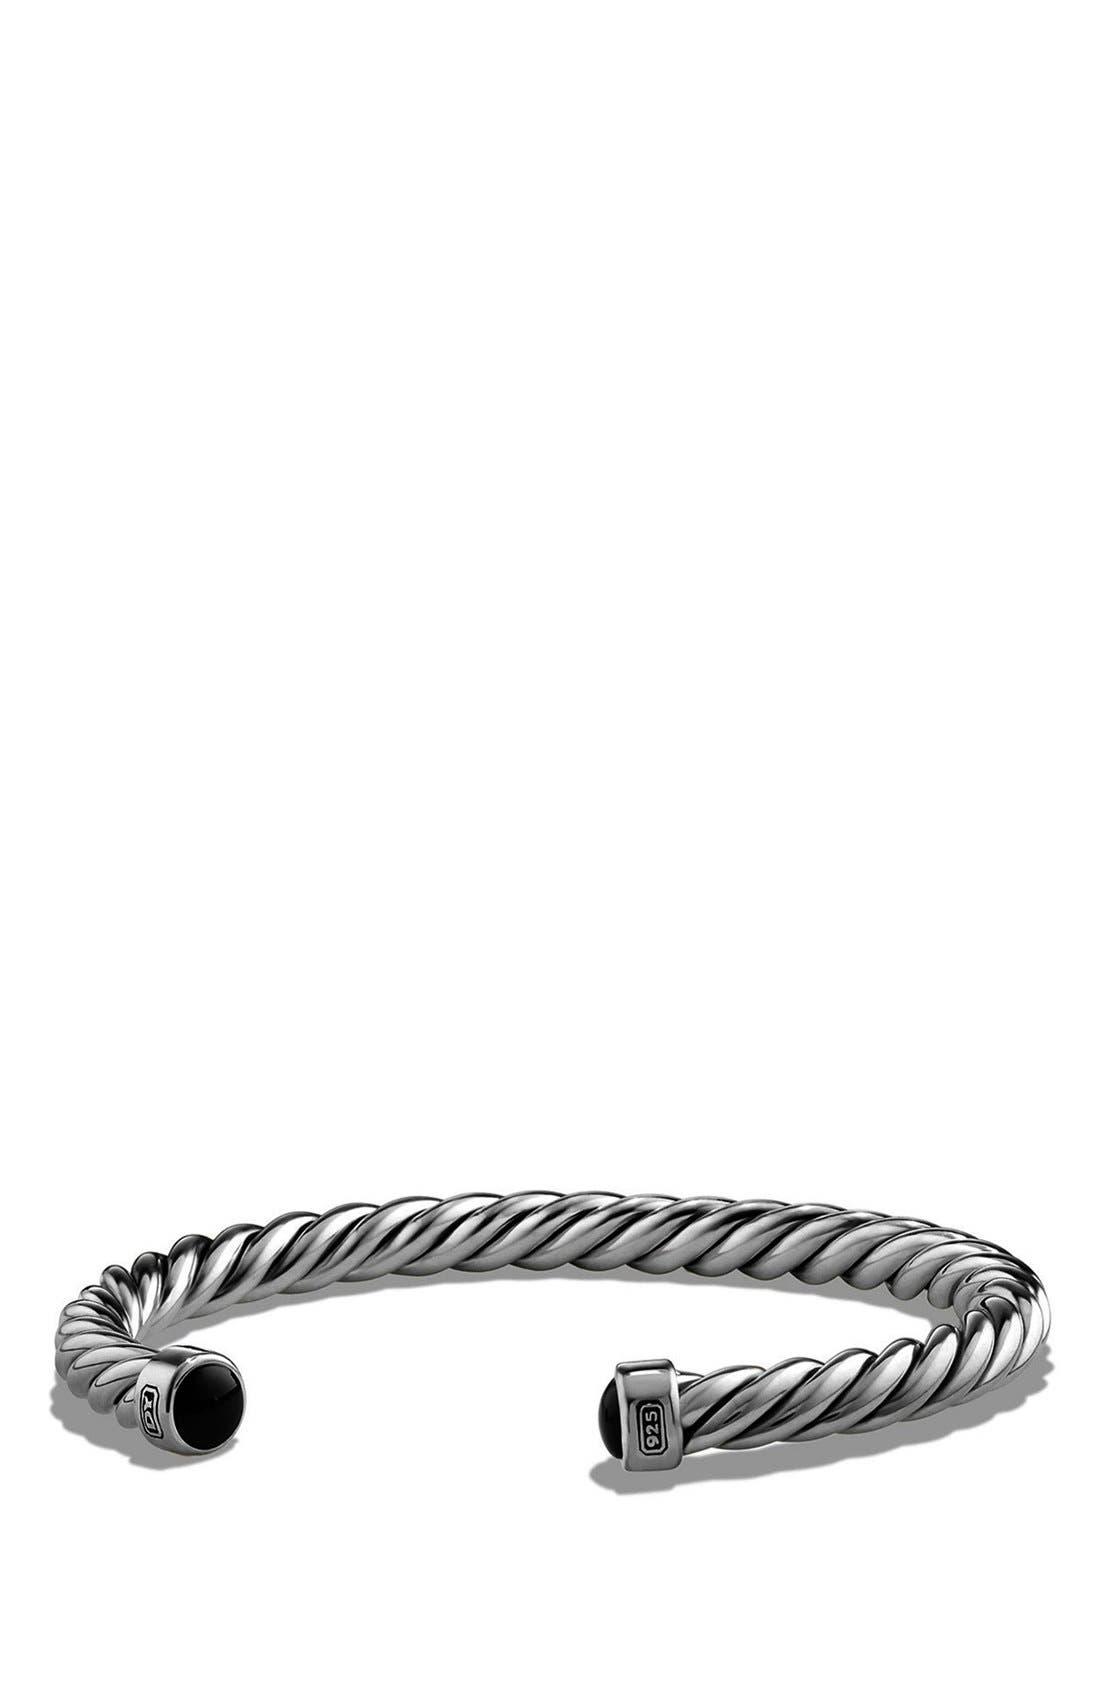 David Yurman 'Cable Classics' Cuff Bracelet